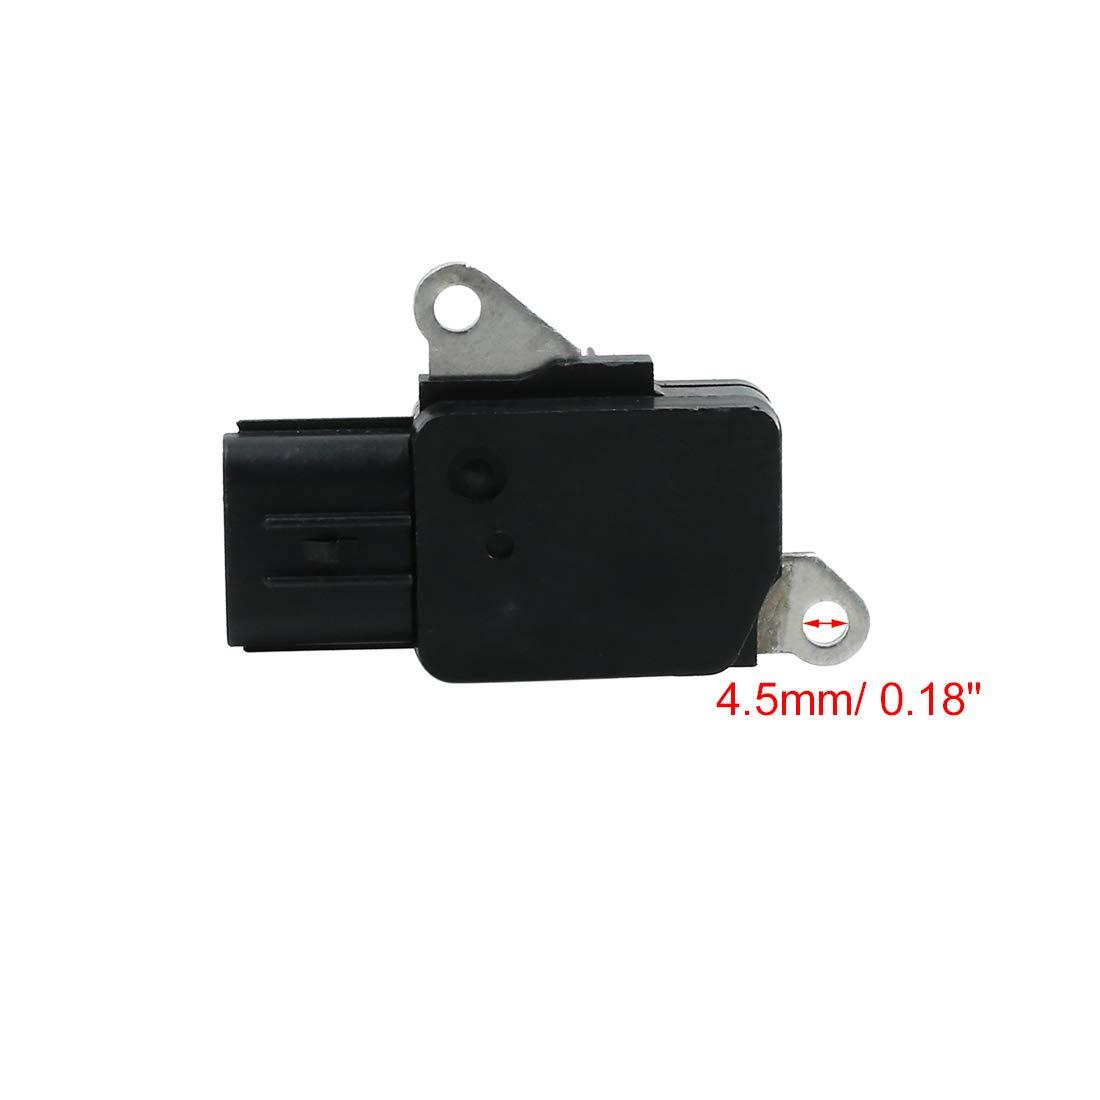 X AUTOHAUX Car 5 Pins Mass Air Flow Meter Sensor 22204-22010 DC 12V for Toyota Corolla 2003-2008